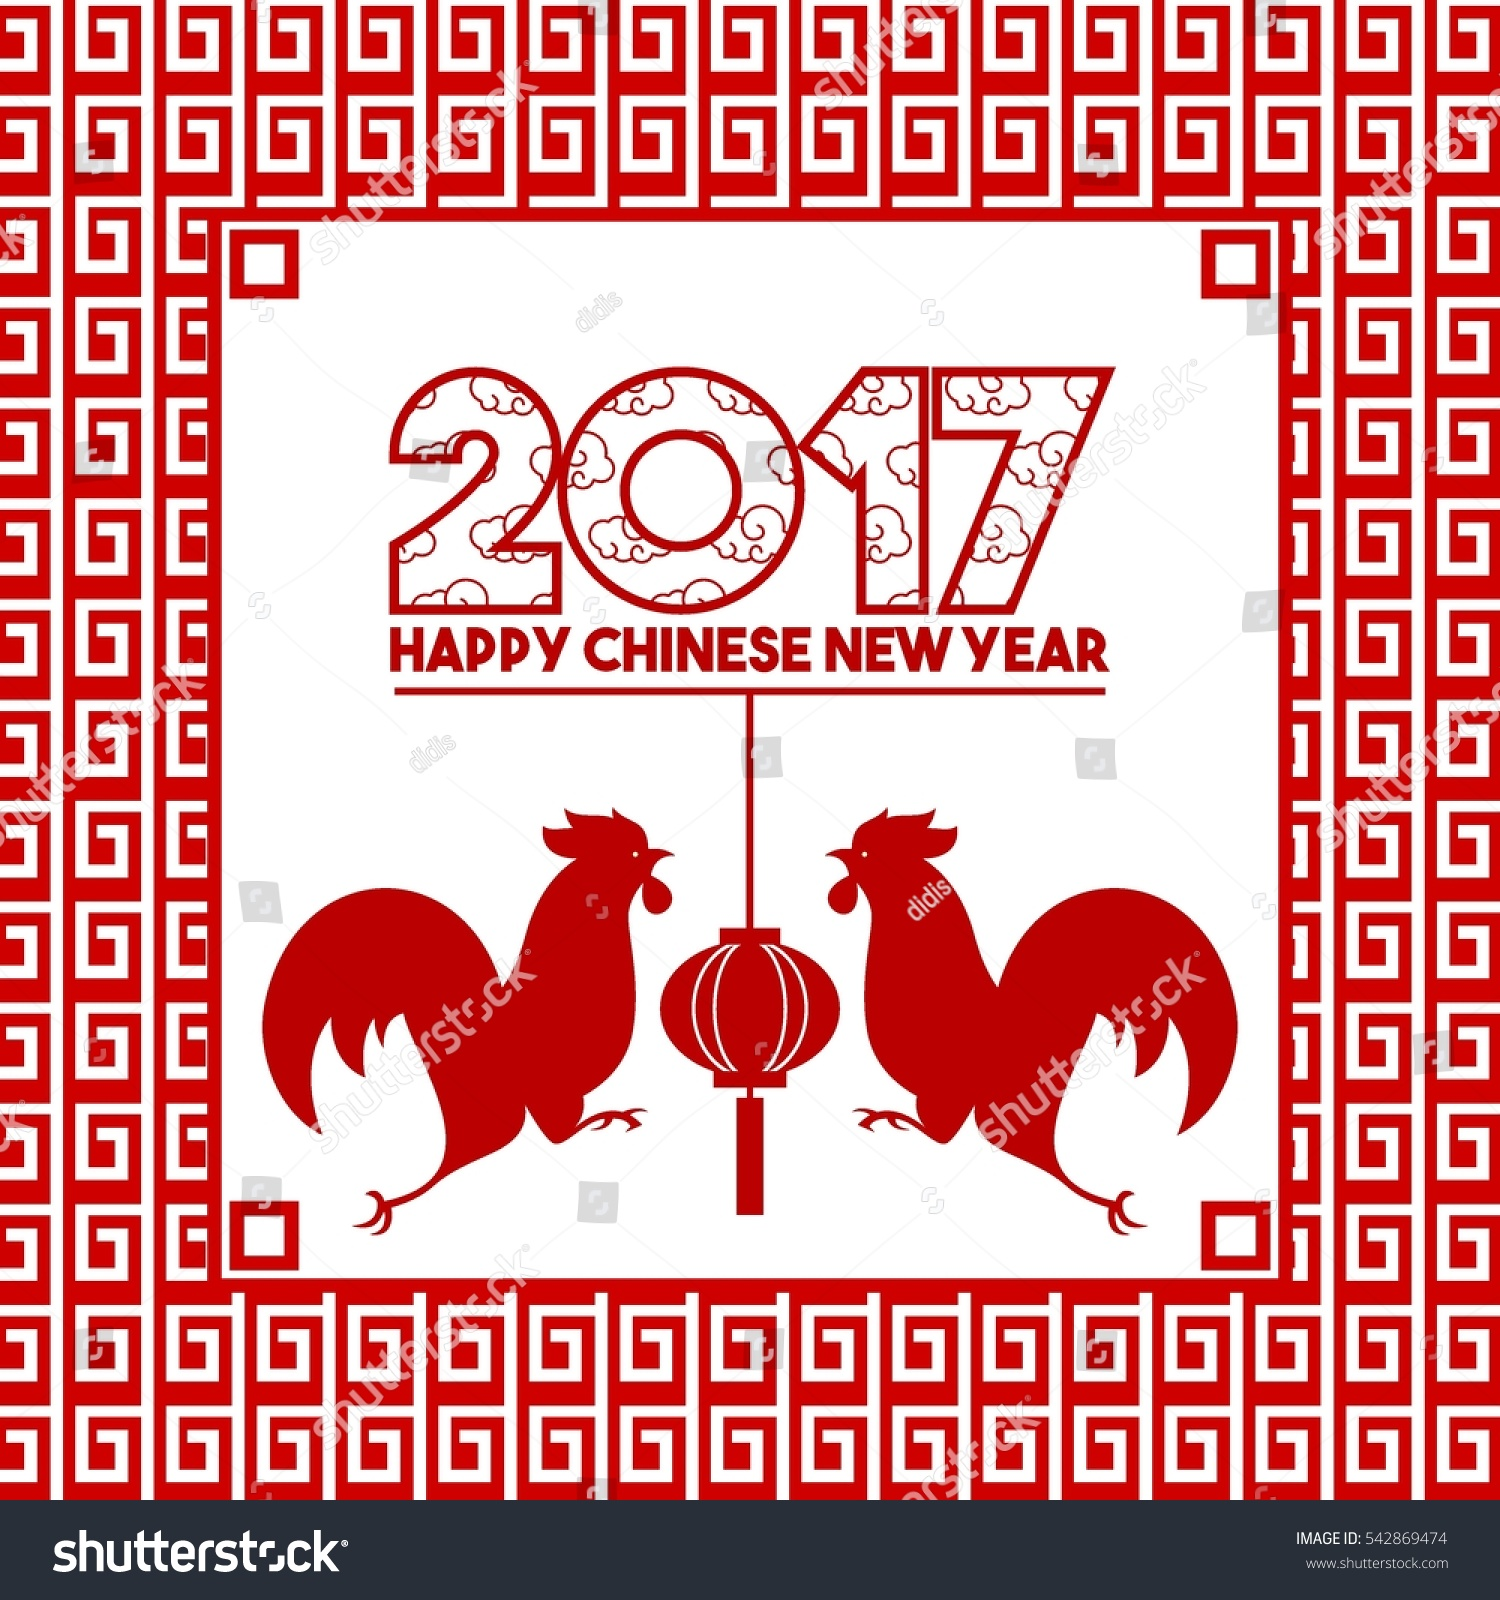 2017 chinese new year banner - Chinese New Year 2001